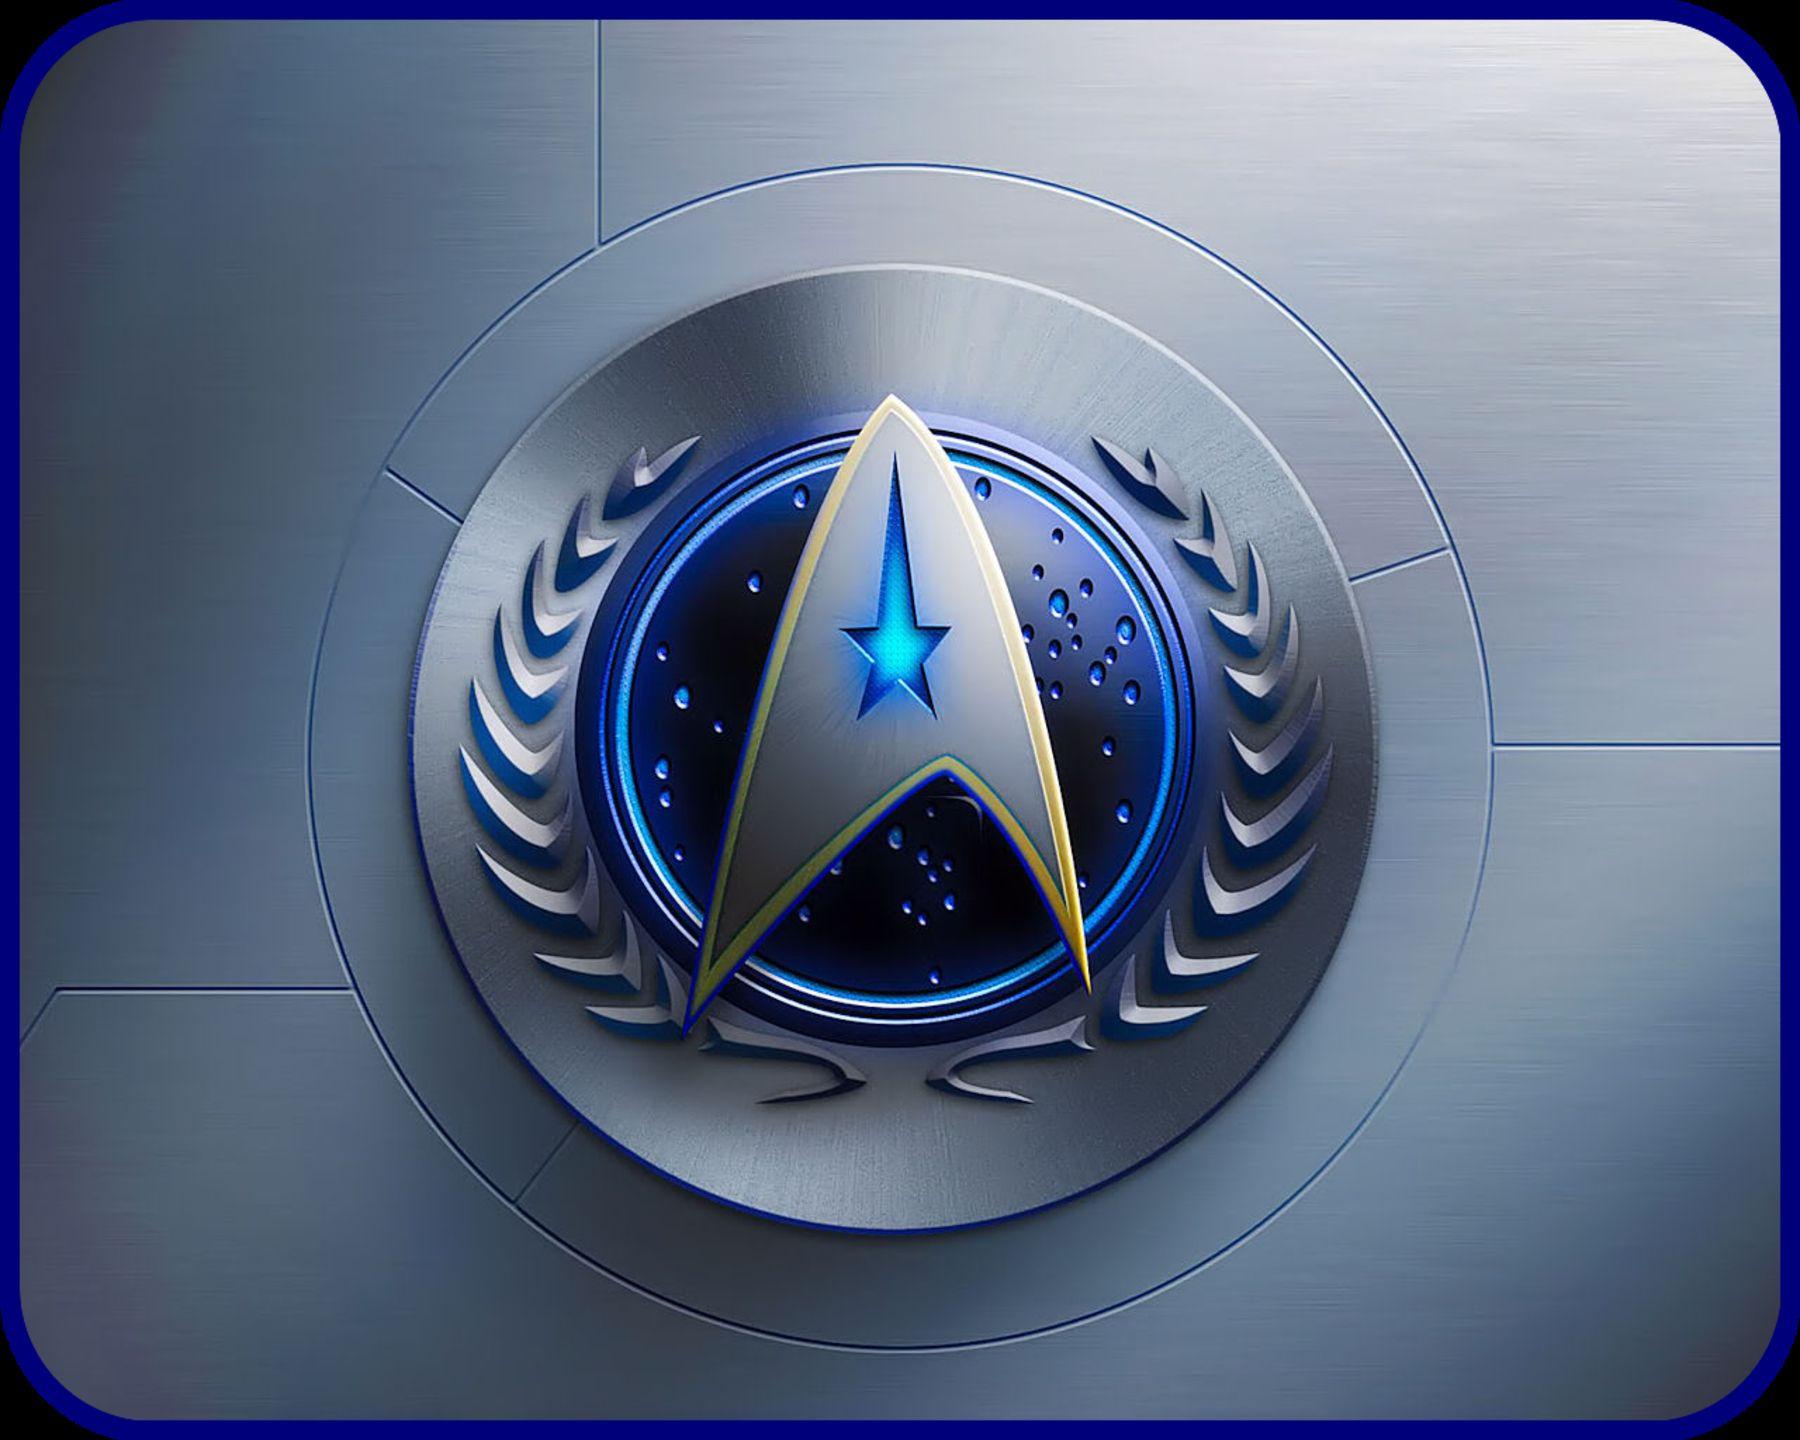 Starfleet Emblem Of The Ufp Star Trek » [1920x1440 Pixel